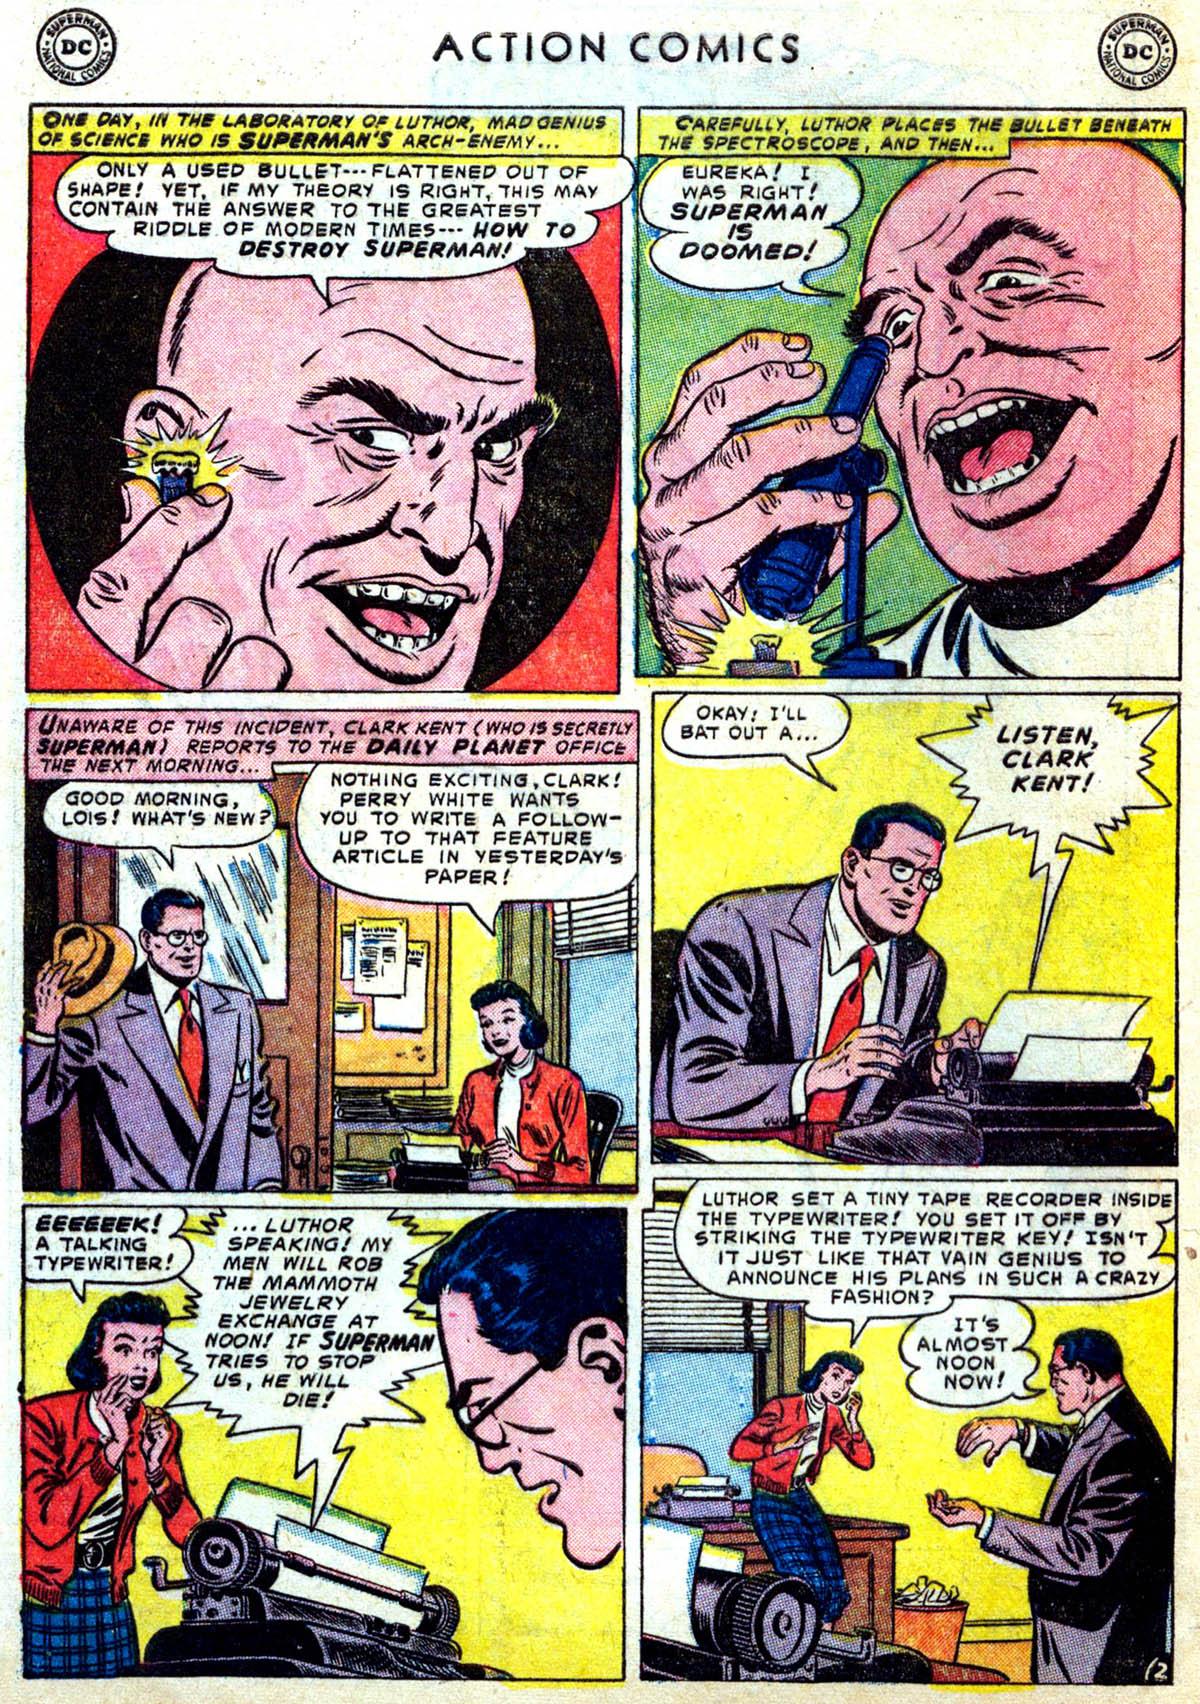 Action Comics (1938) 183 Page 3